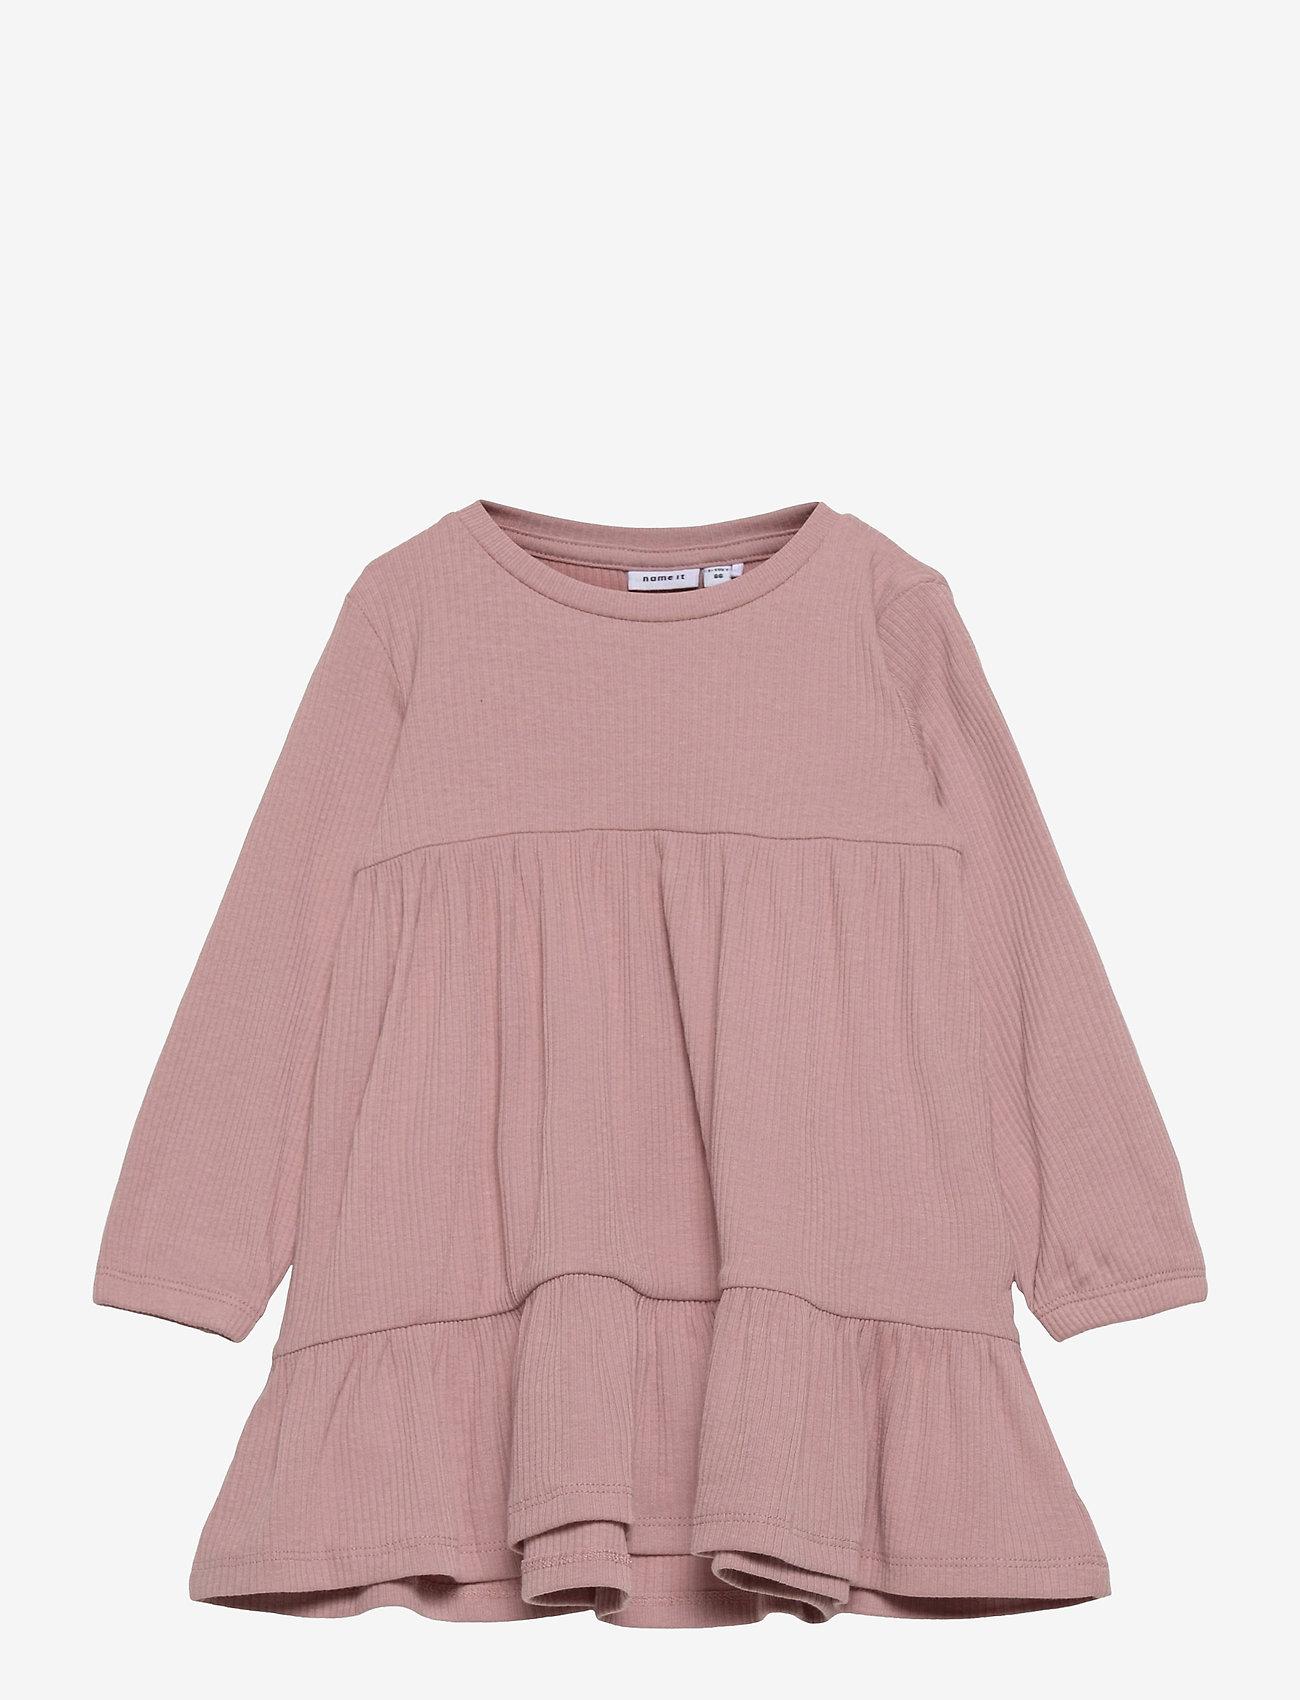 name it - NMFFABBI LS DRESS - kleider - adobe rose - 0